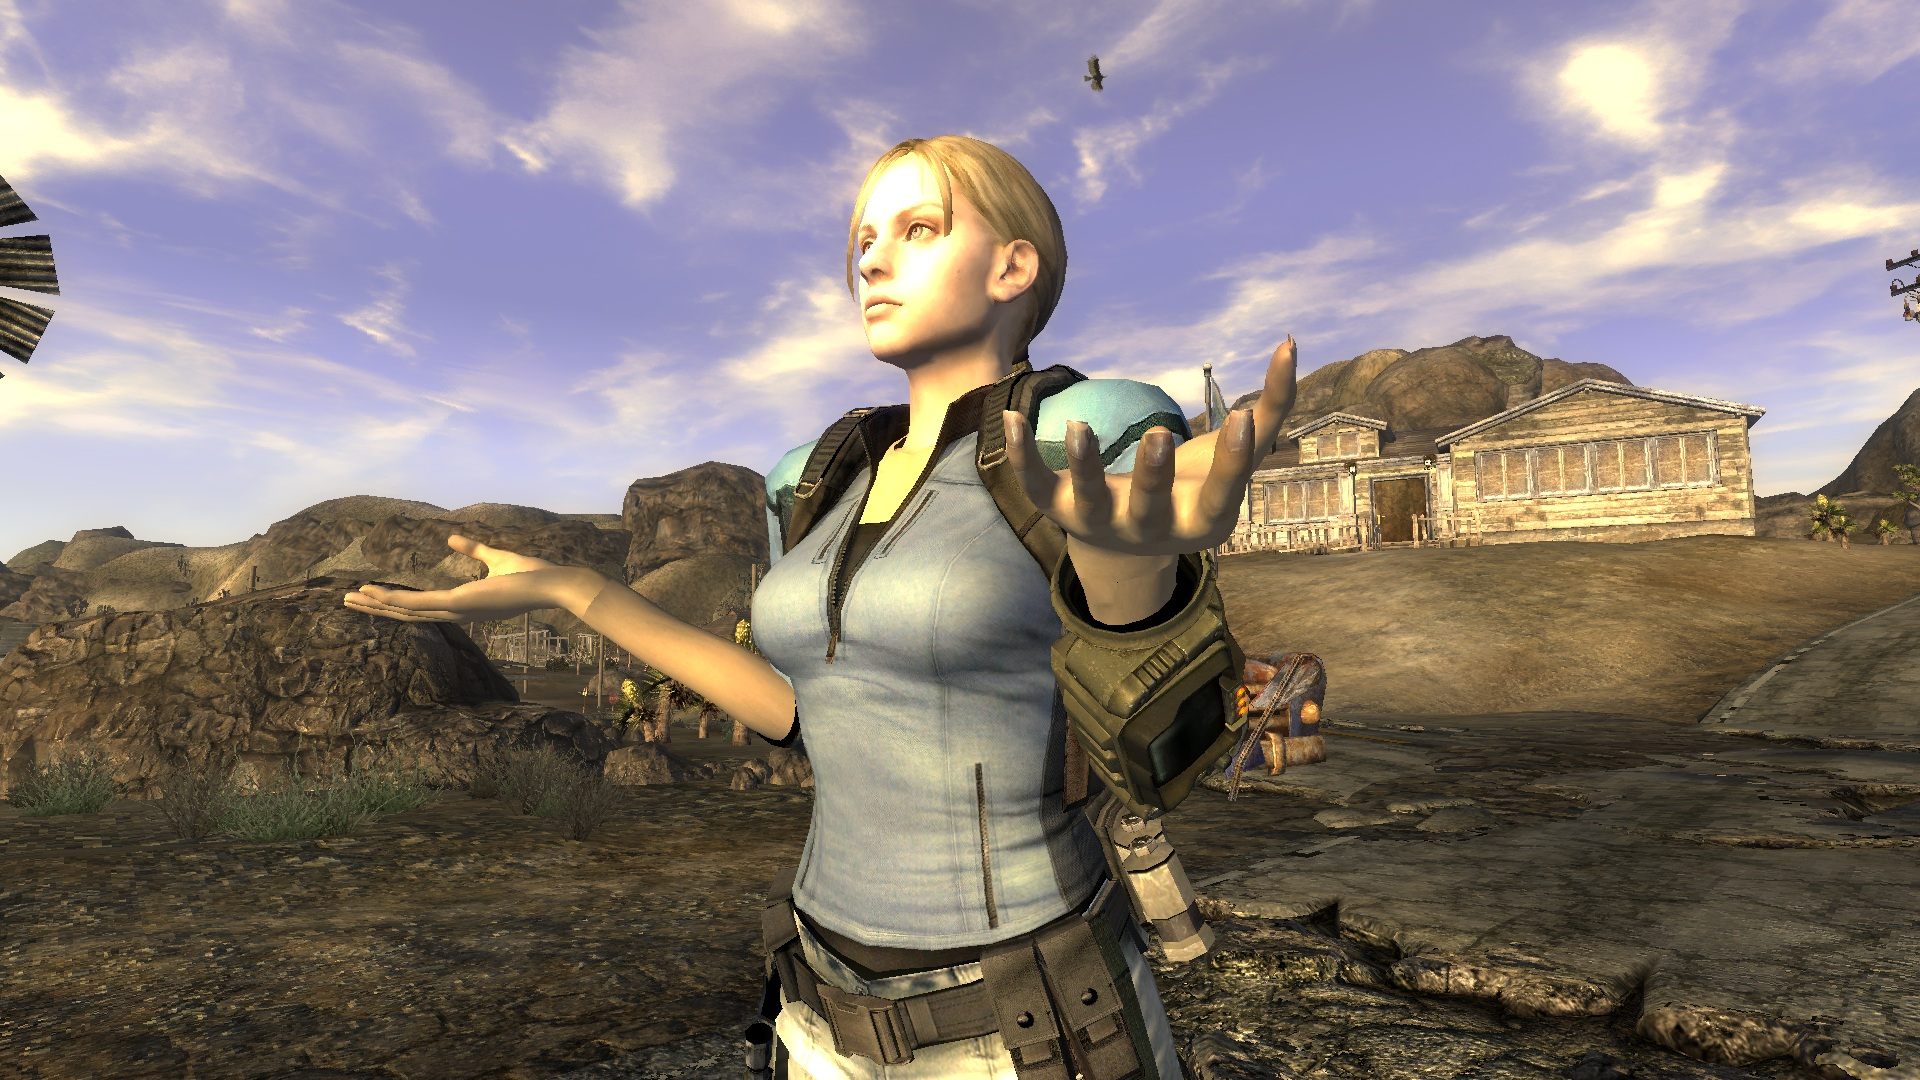 Skyrim Wallpaper Fall Fallout New Vegas Mods And Community